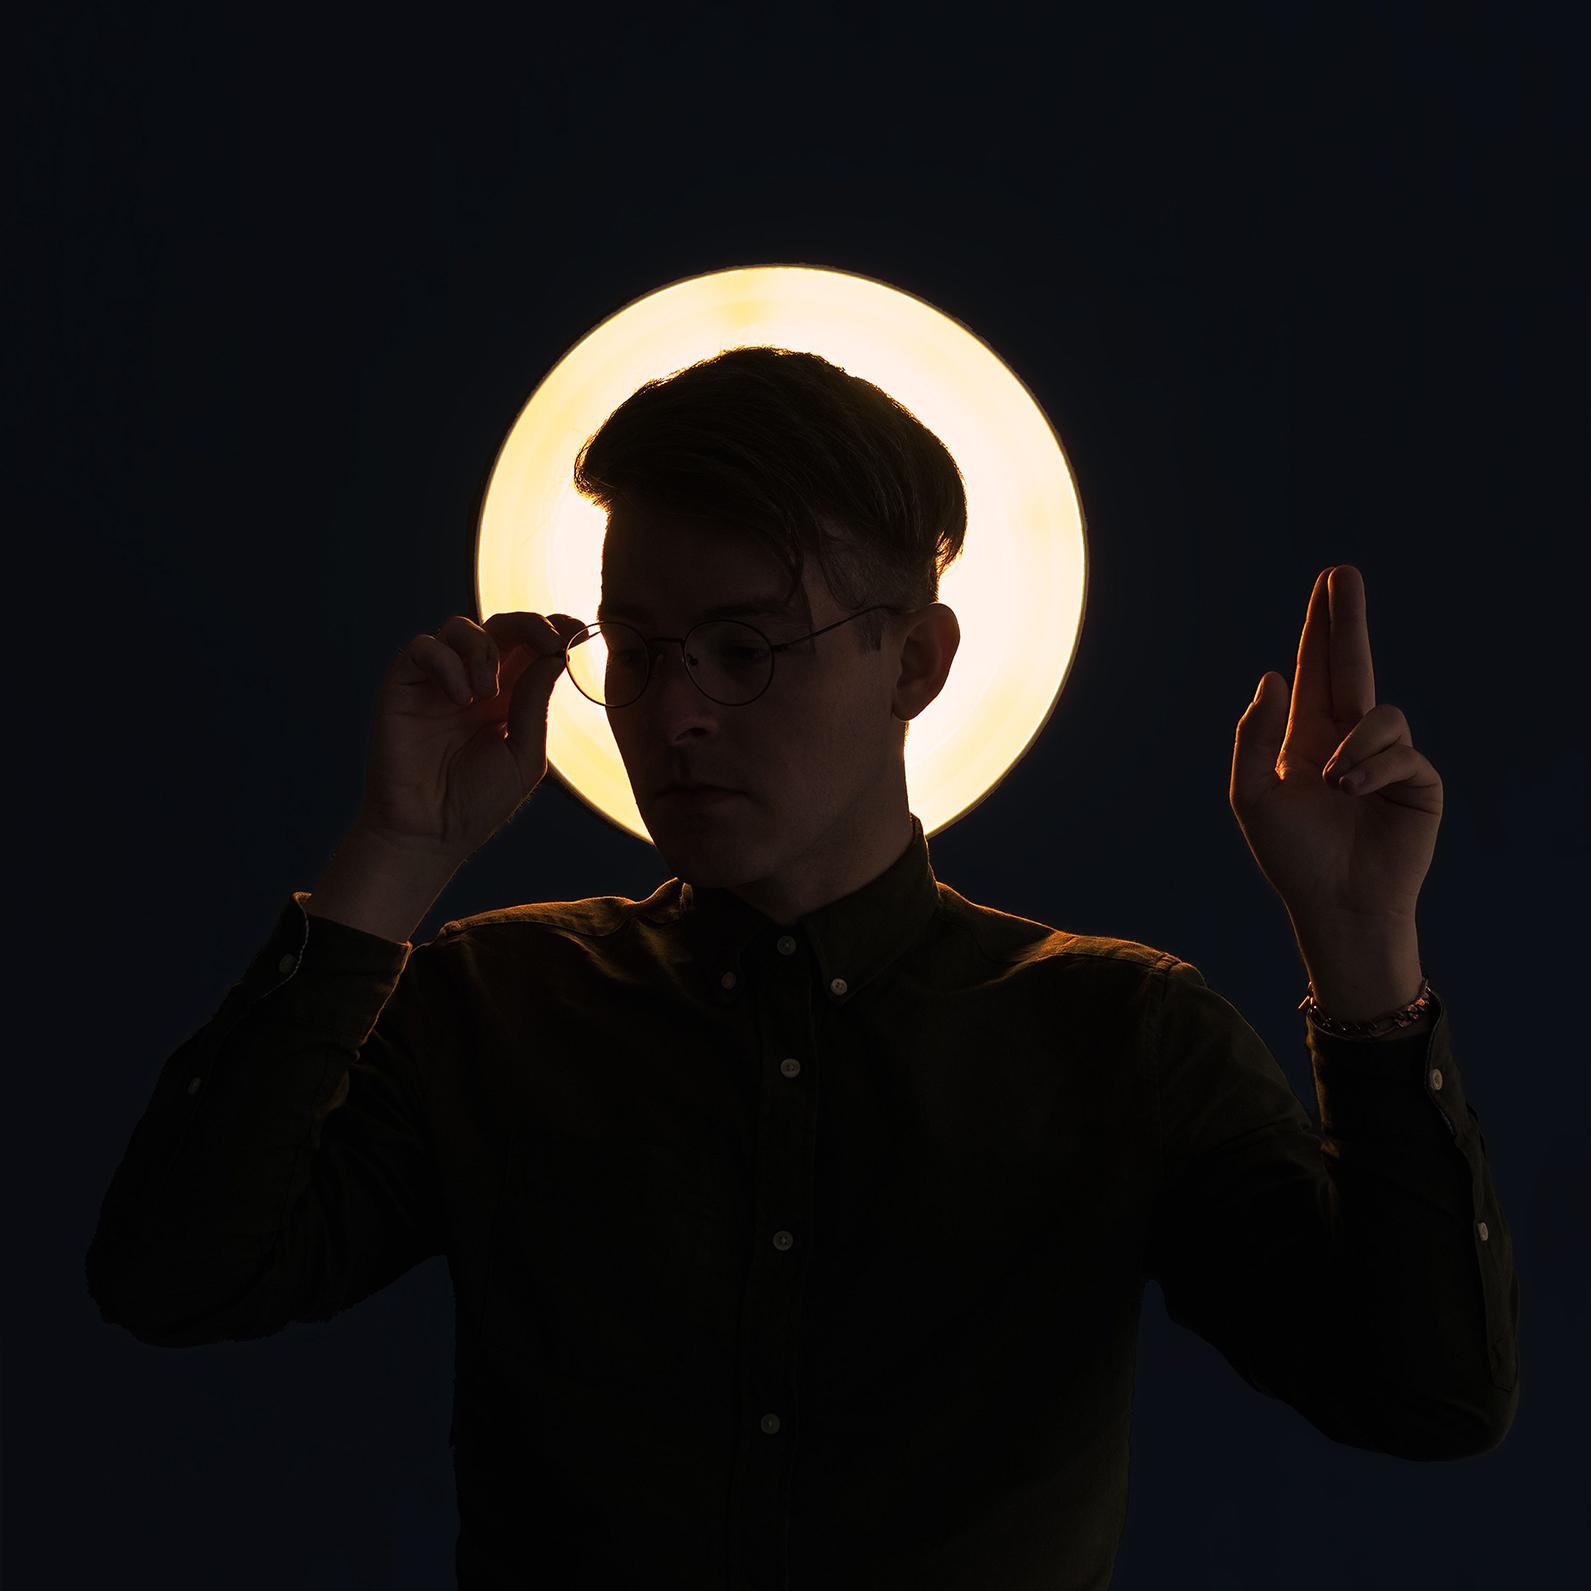 Acclaimed Irish producer SORBET announces debut album - Listen to lead single 'I Heard His Scythe feat. Maija Sofia'